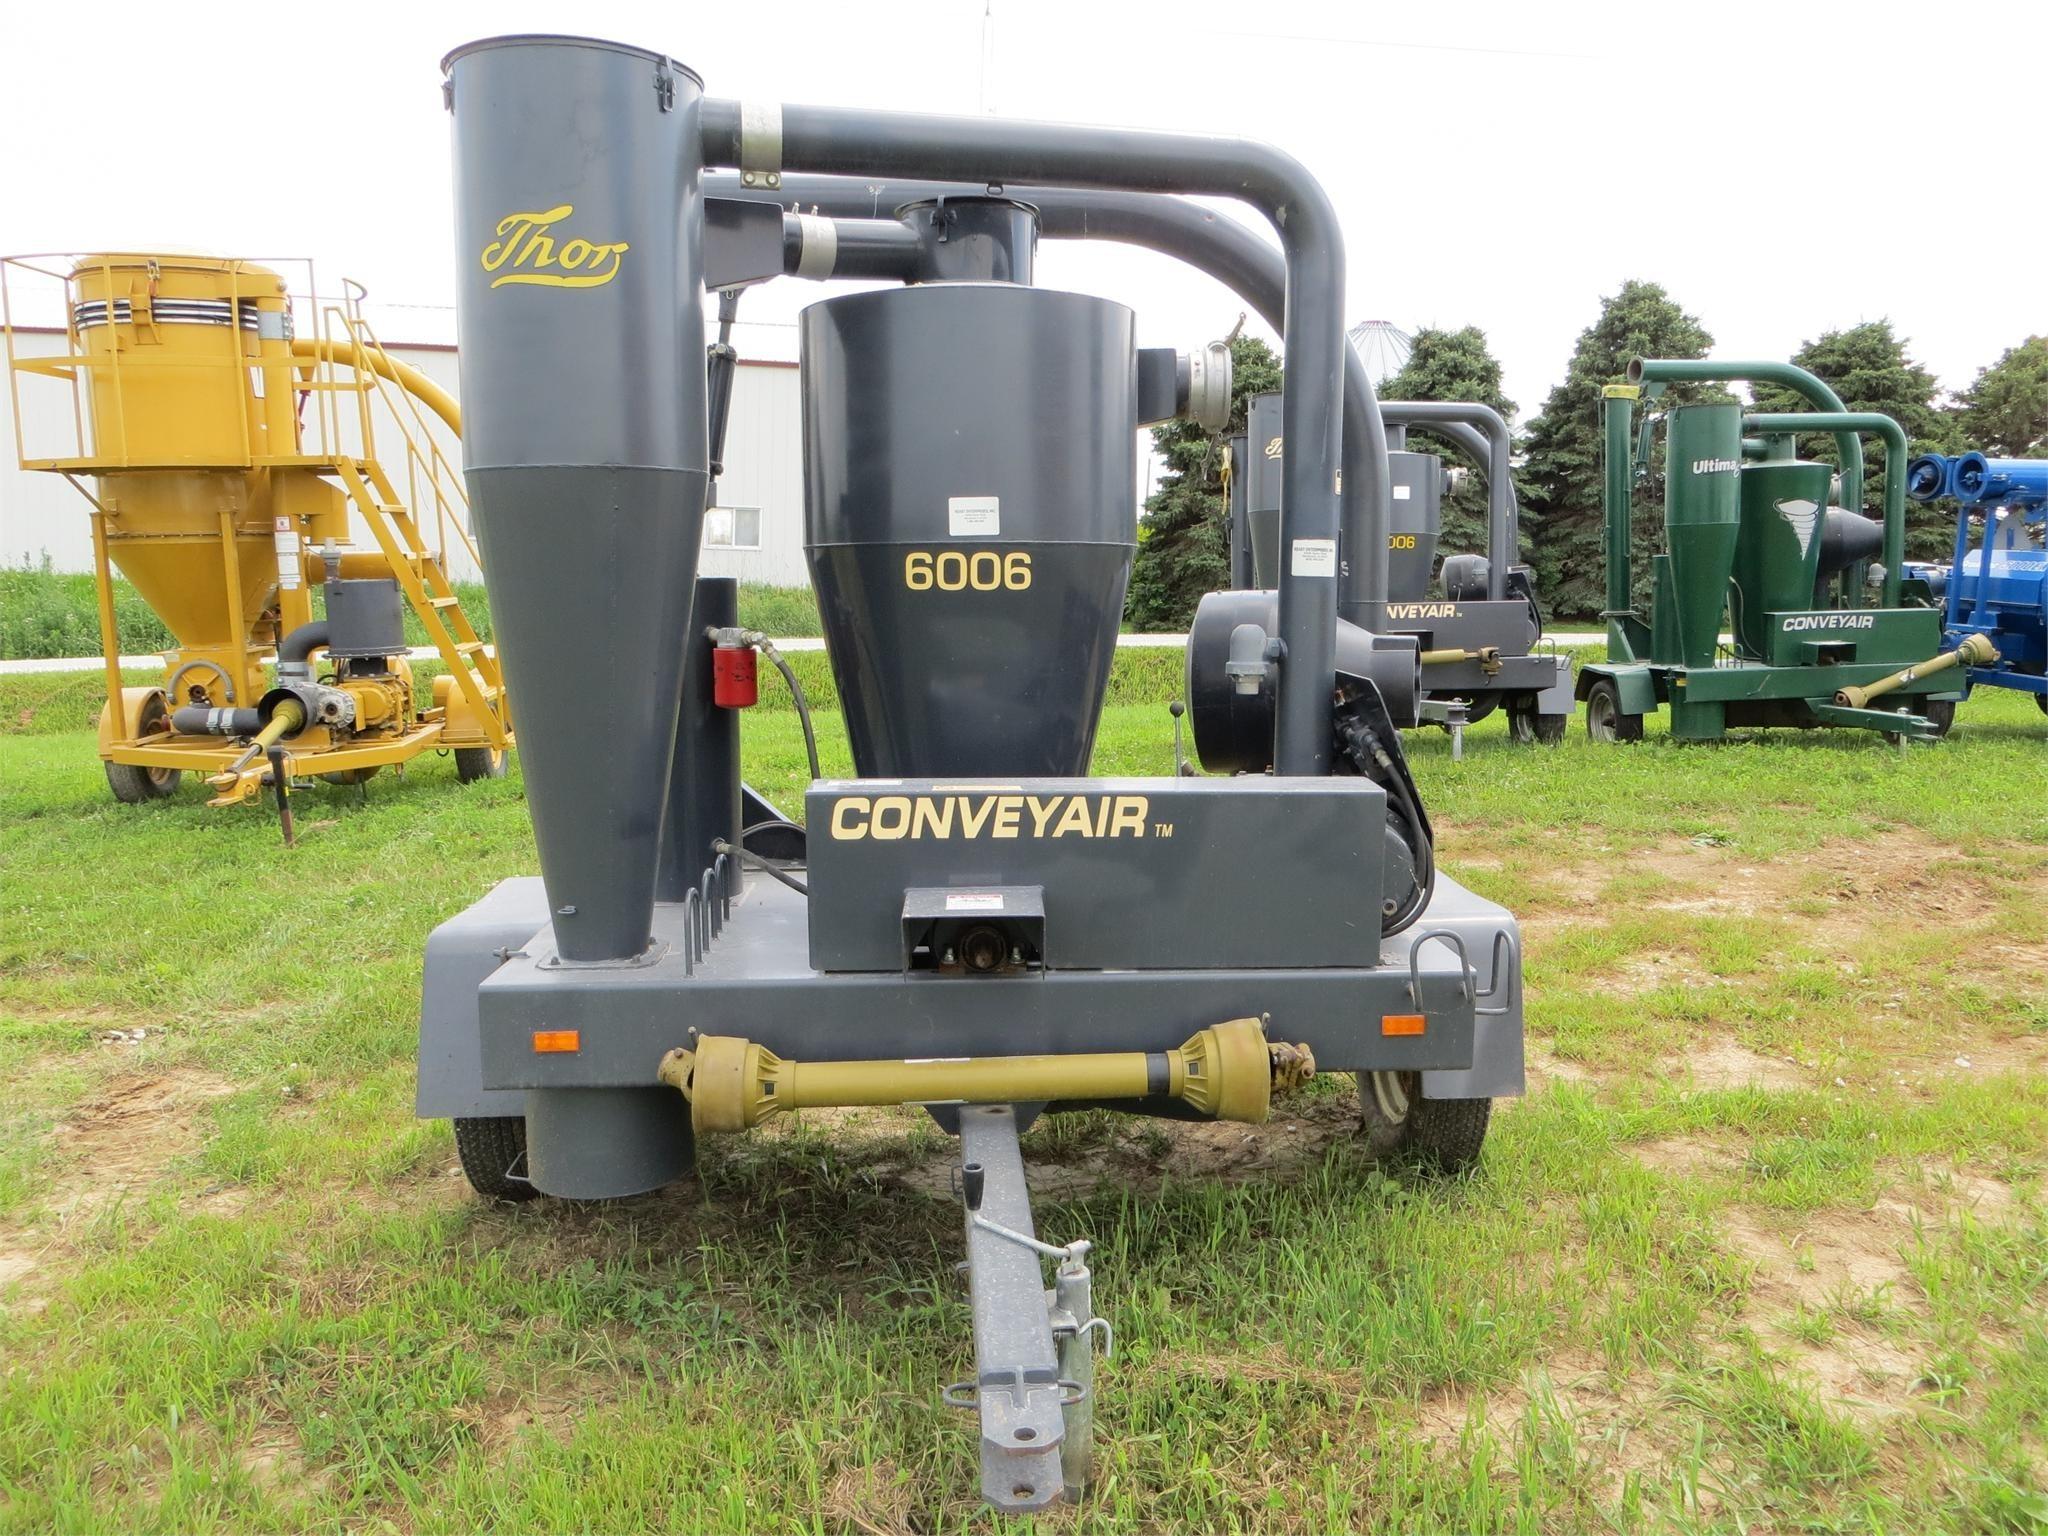 2006 ConveyAir 6006 Grain Vac